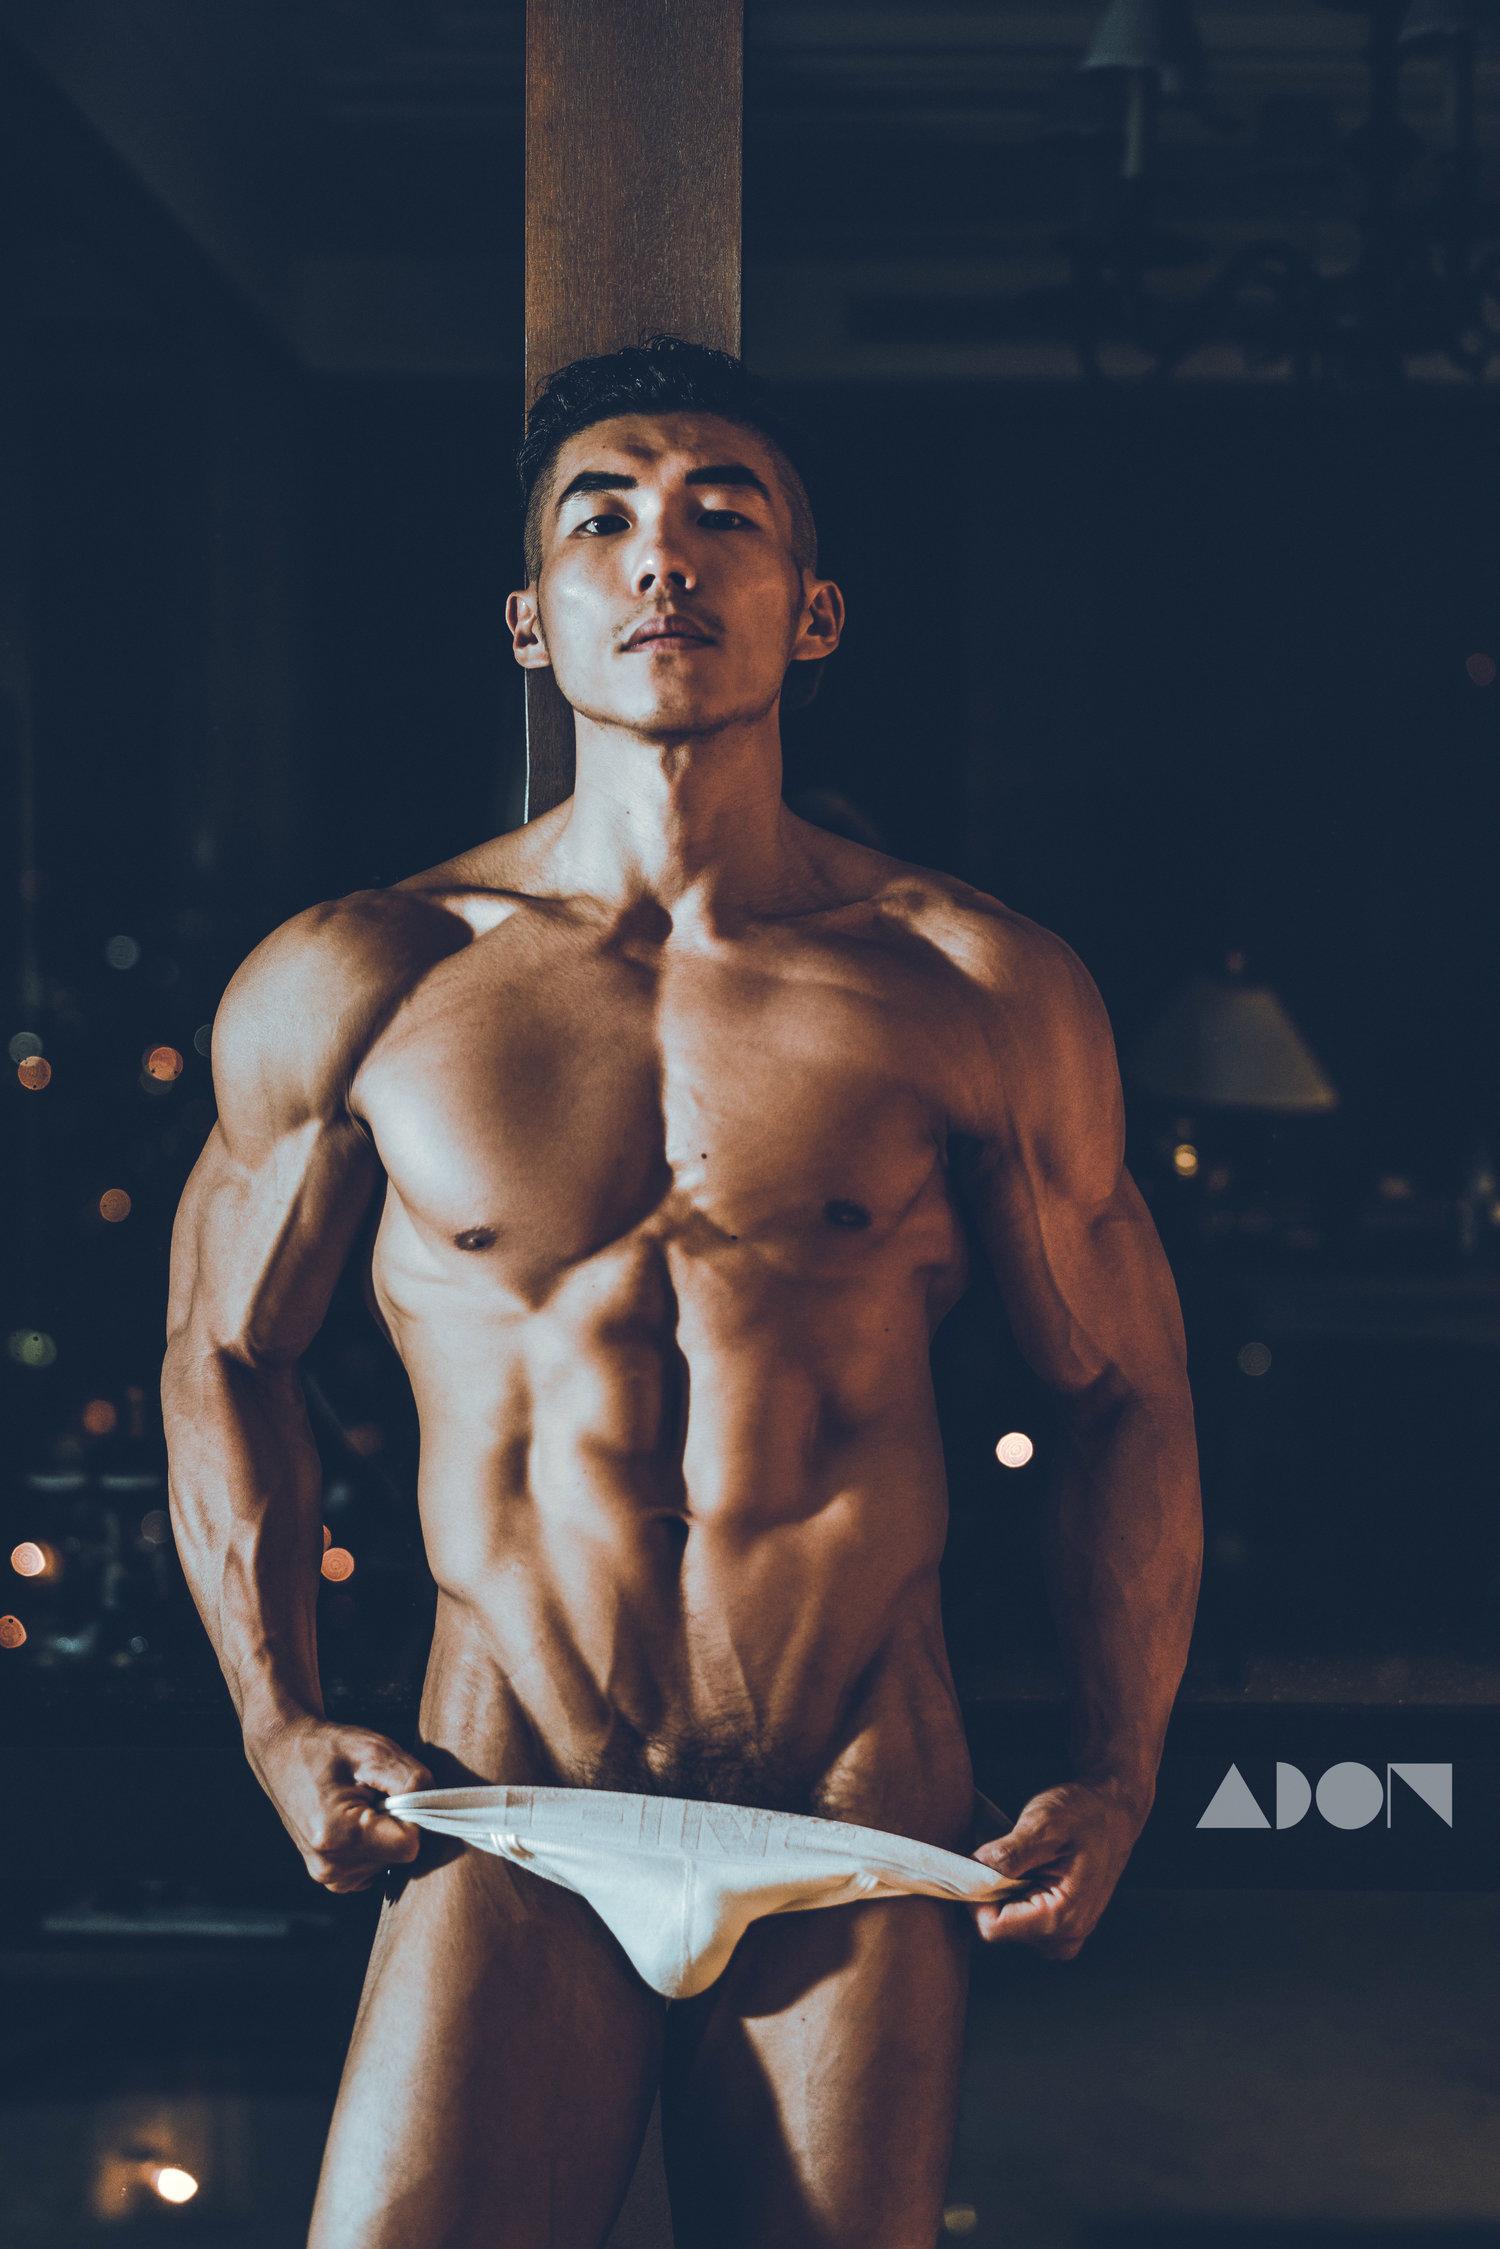 Adon Exclusive: Model Minsu Lee By UTO